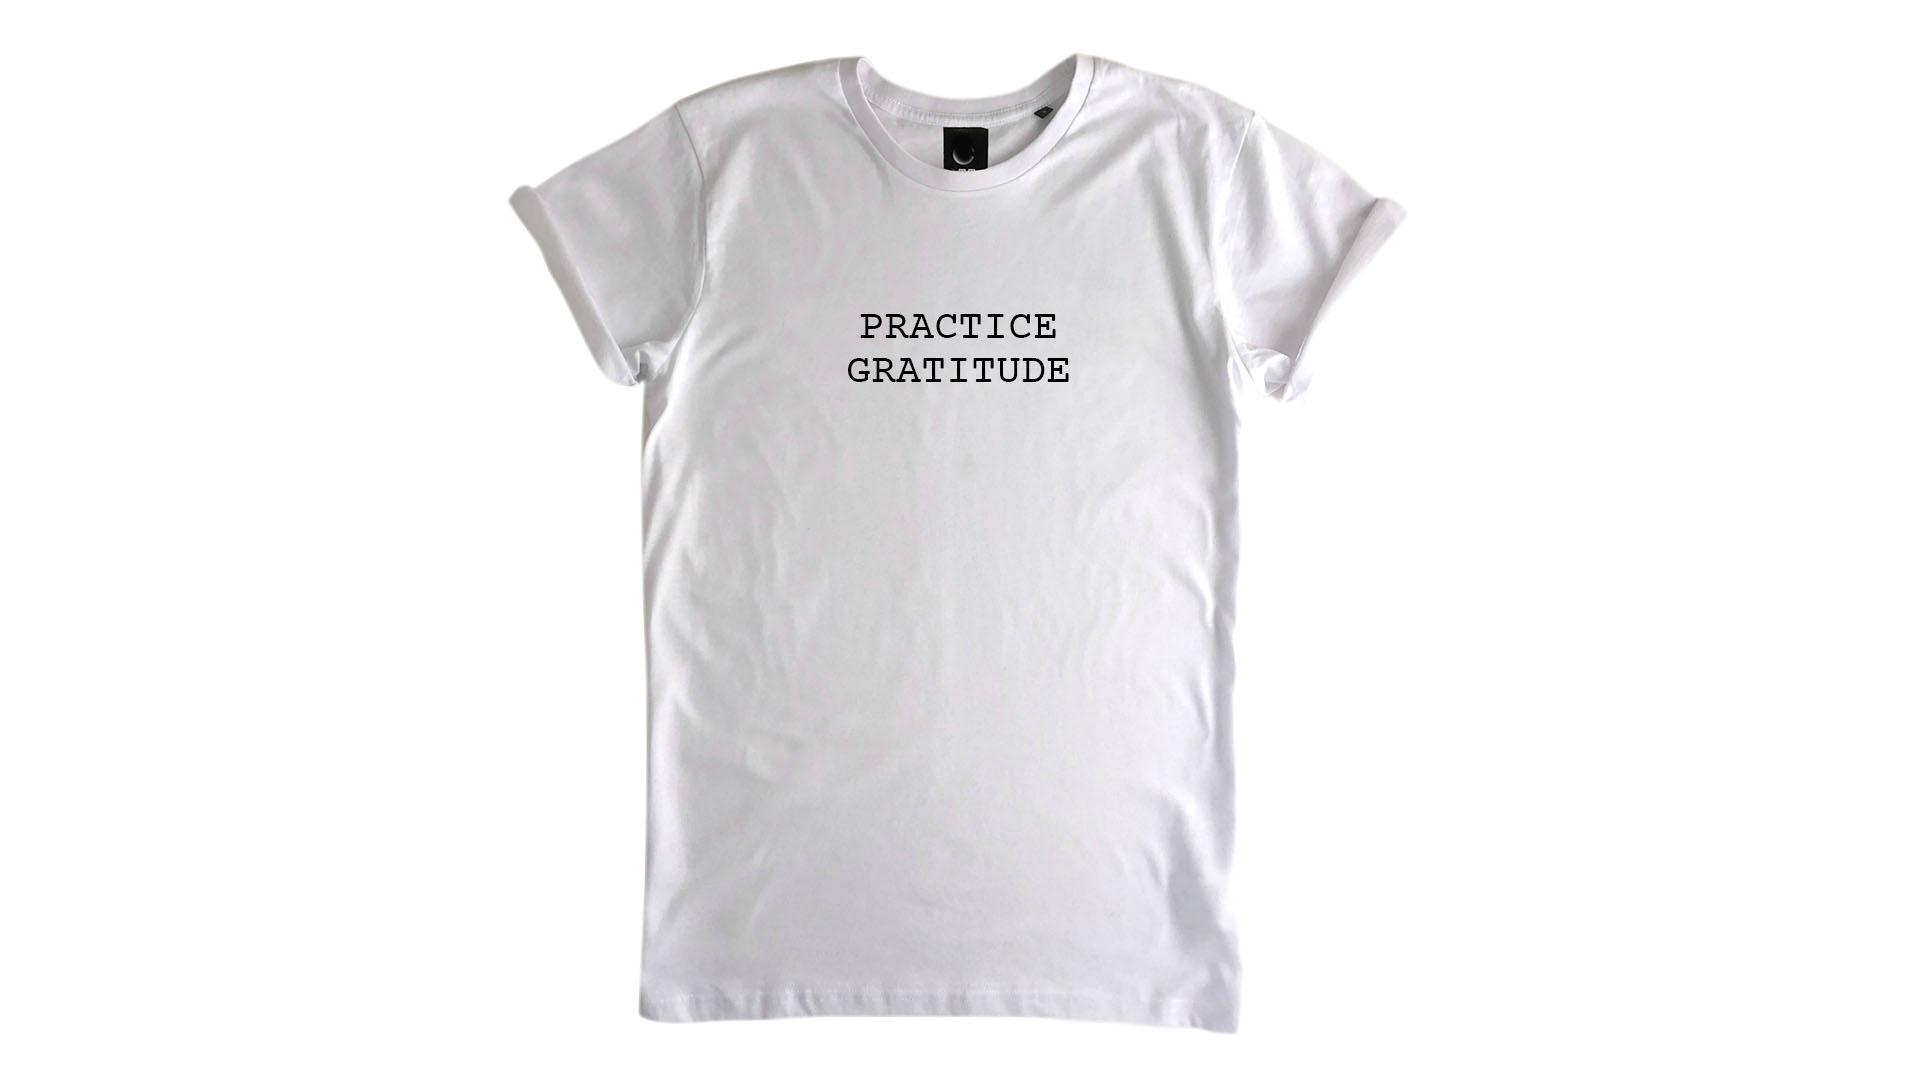 LiveLearn.Yoga Yoga T-Shirt Organic Cotton Practice Gratitude White